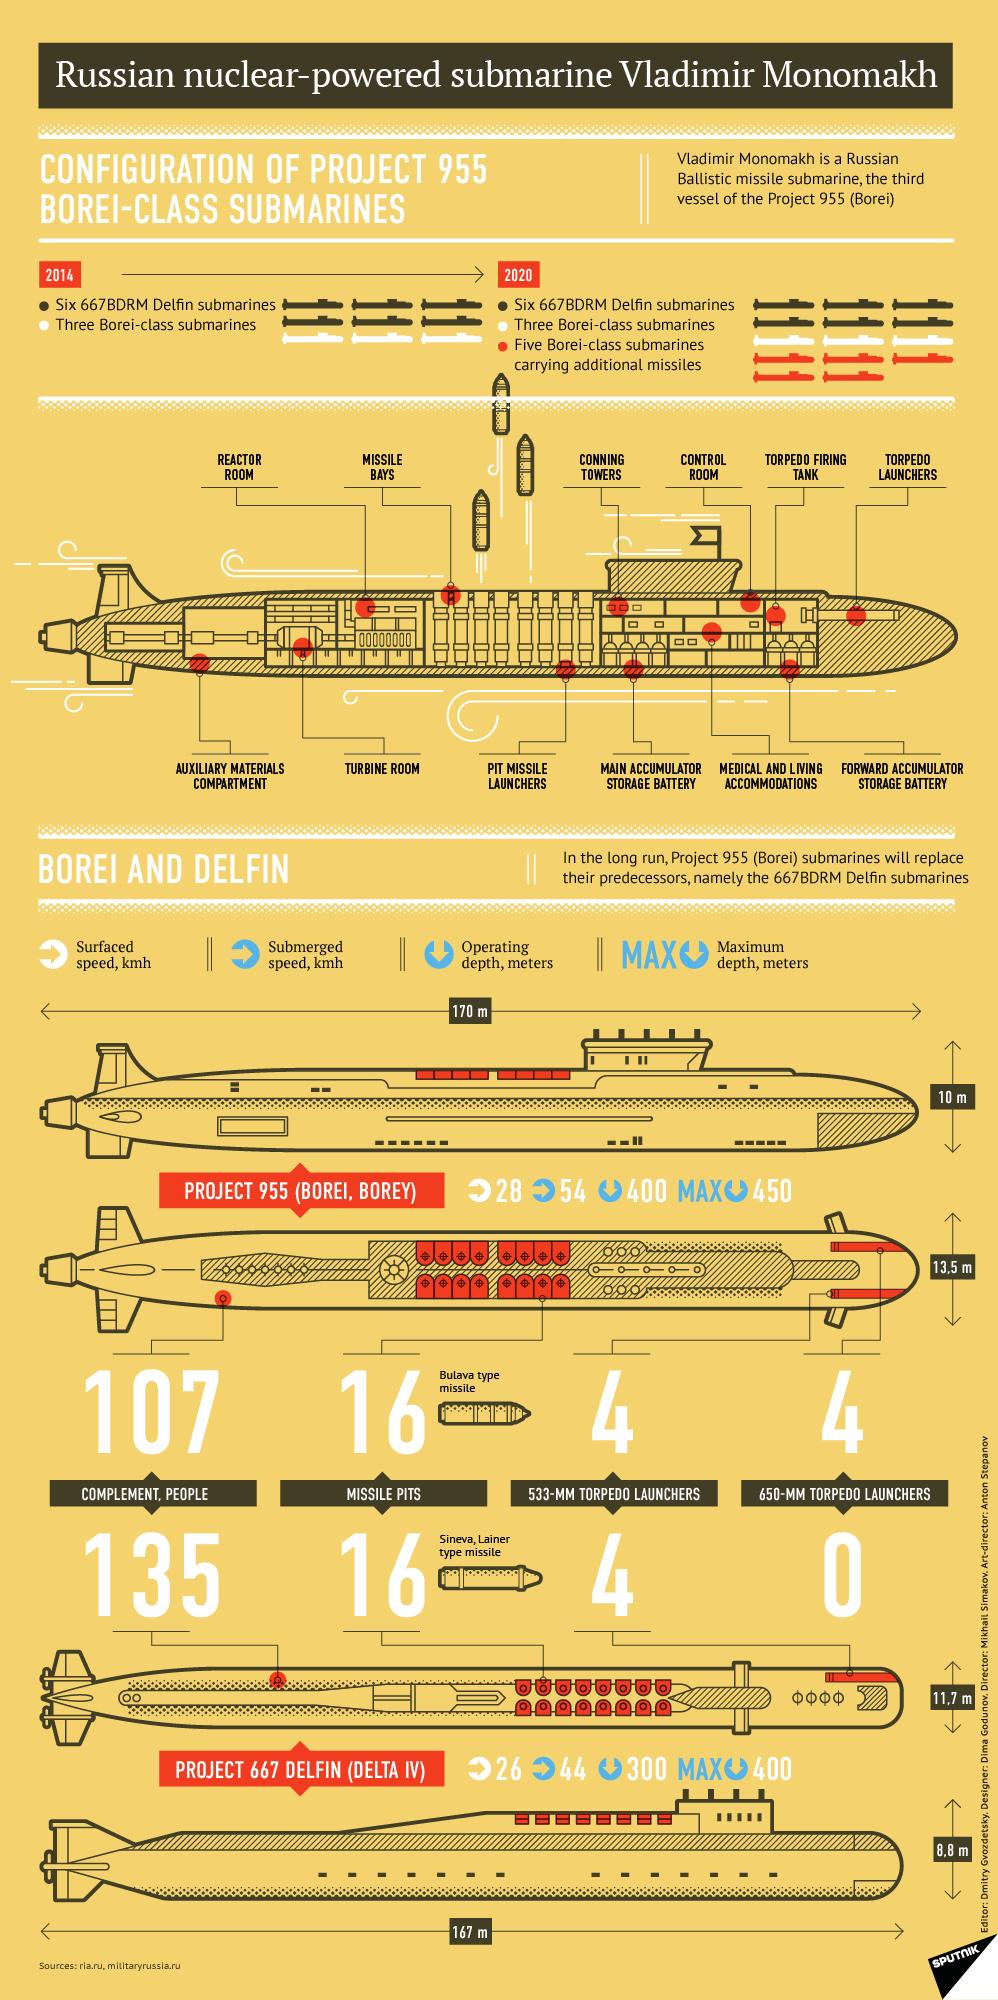 Инфографика: СпутникНюз